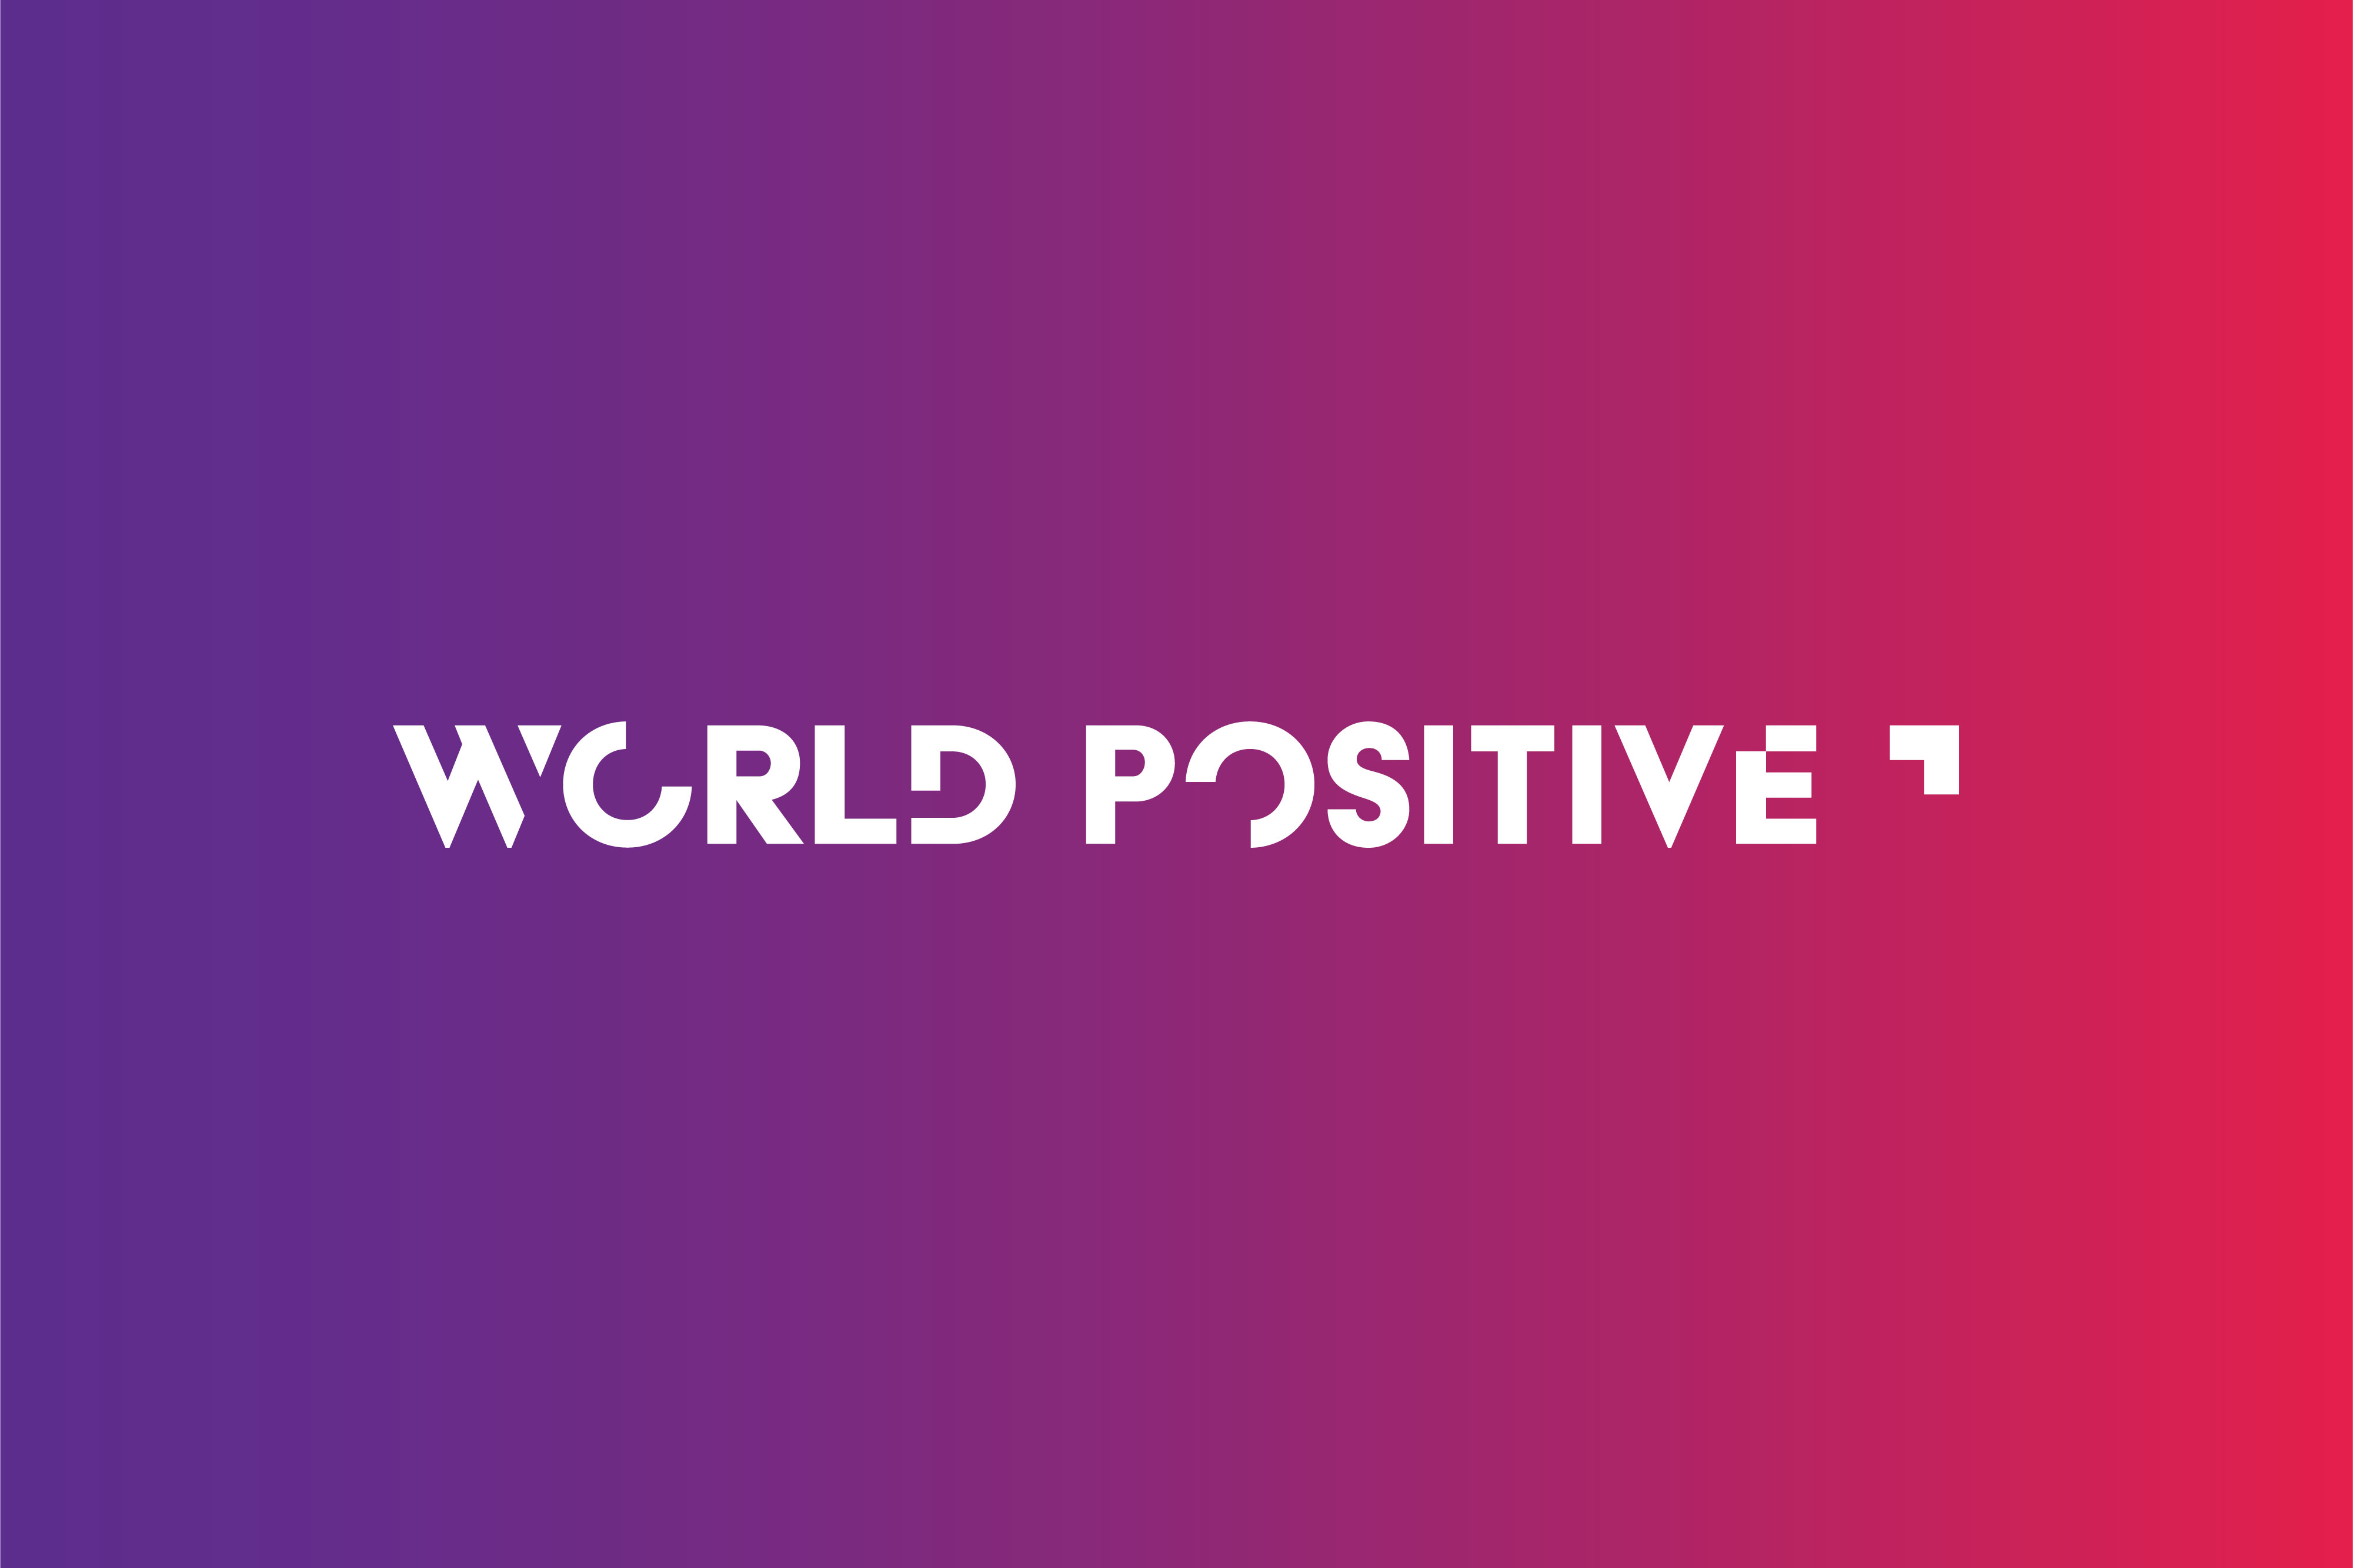 World Positive